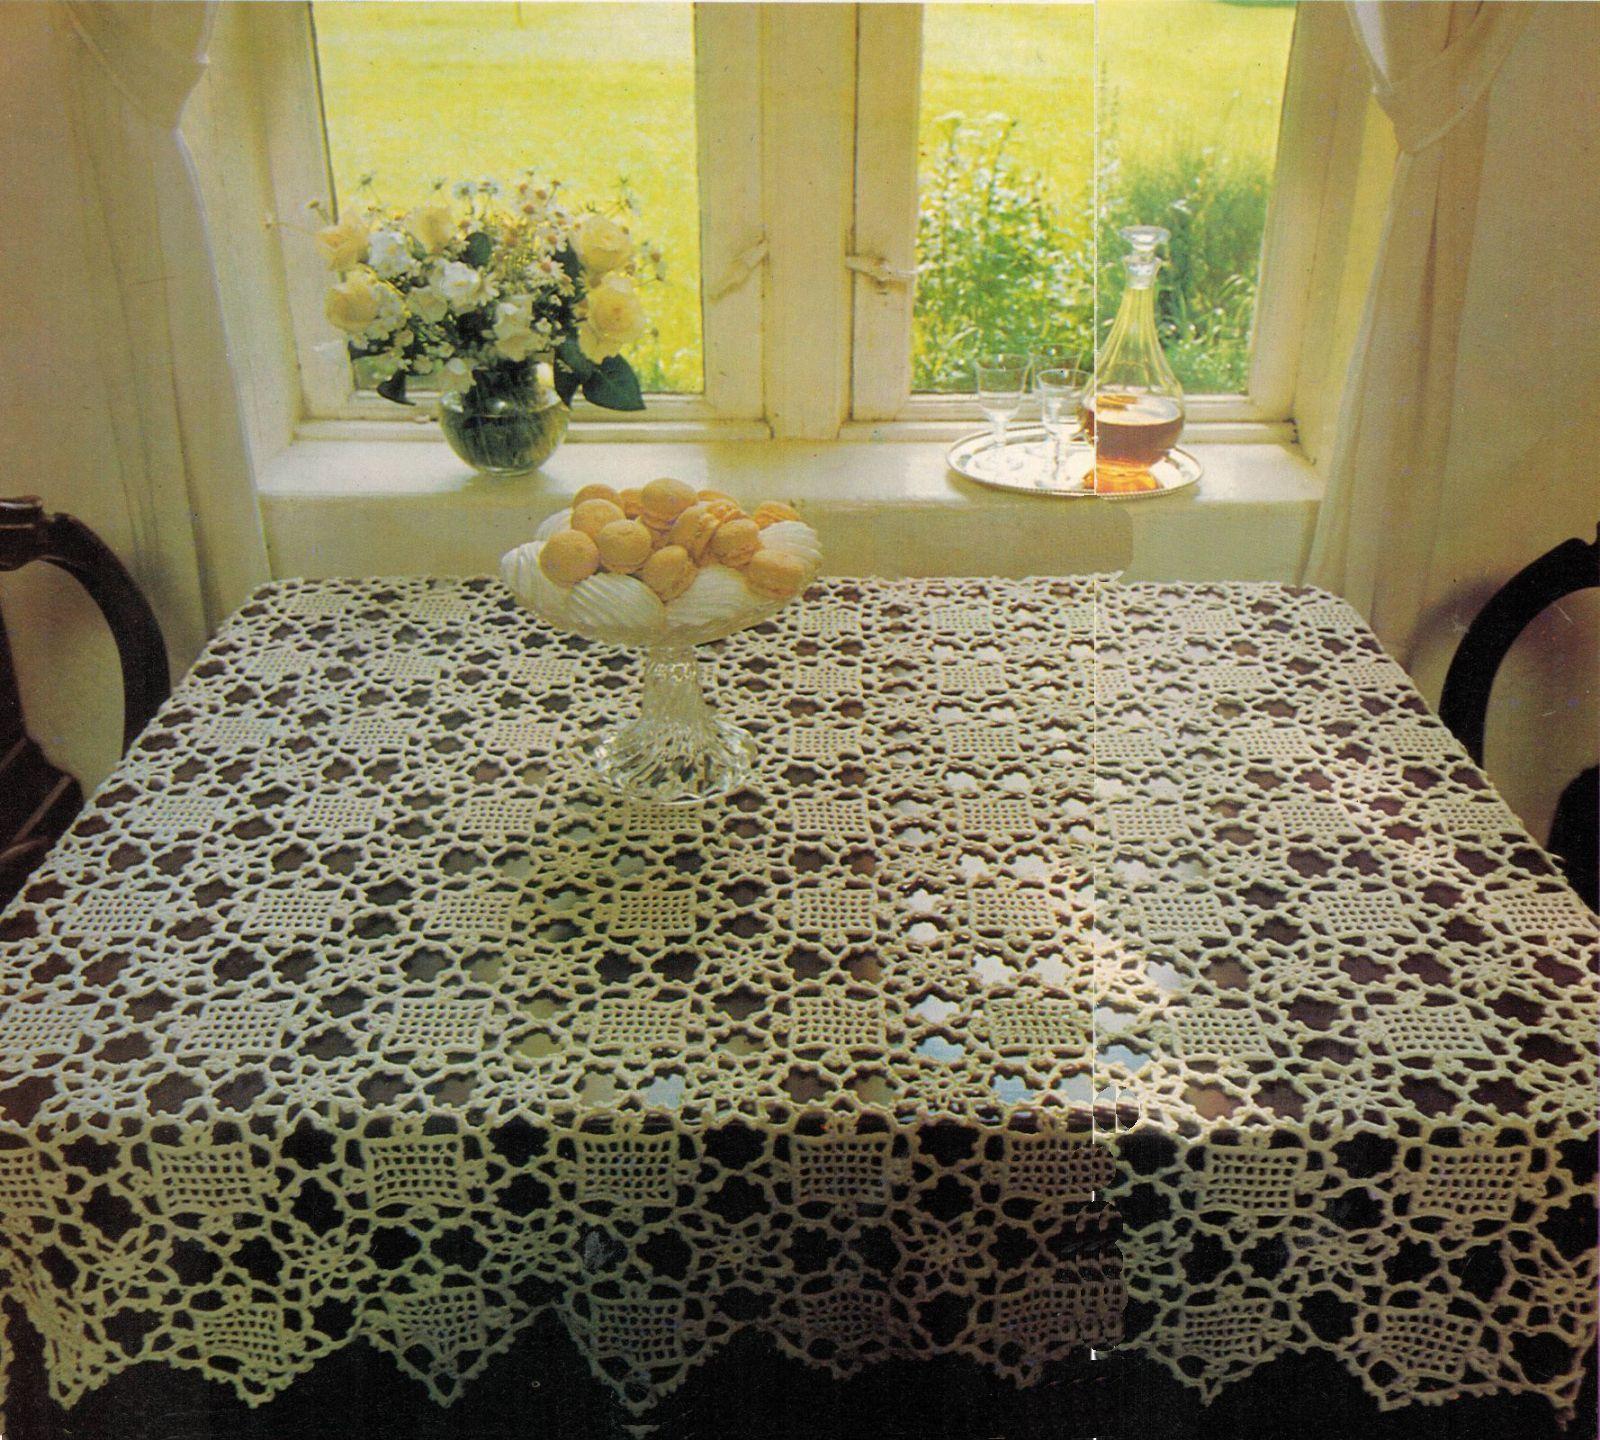 4X Wagon Wheel Lace Rosettes Leaf Flower Tablecloth Crochet Pattern image 6